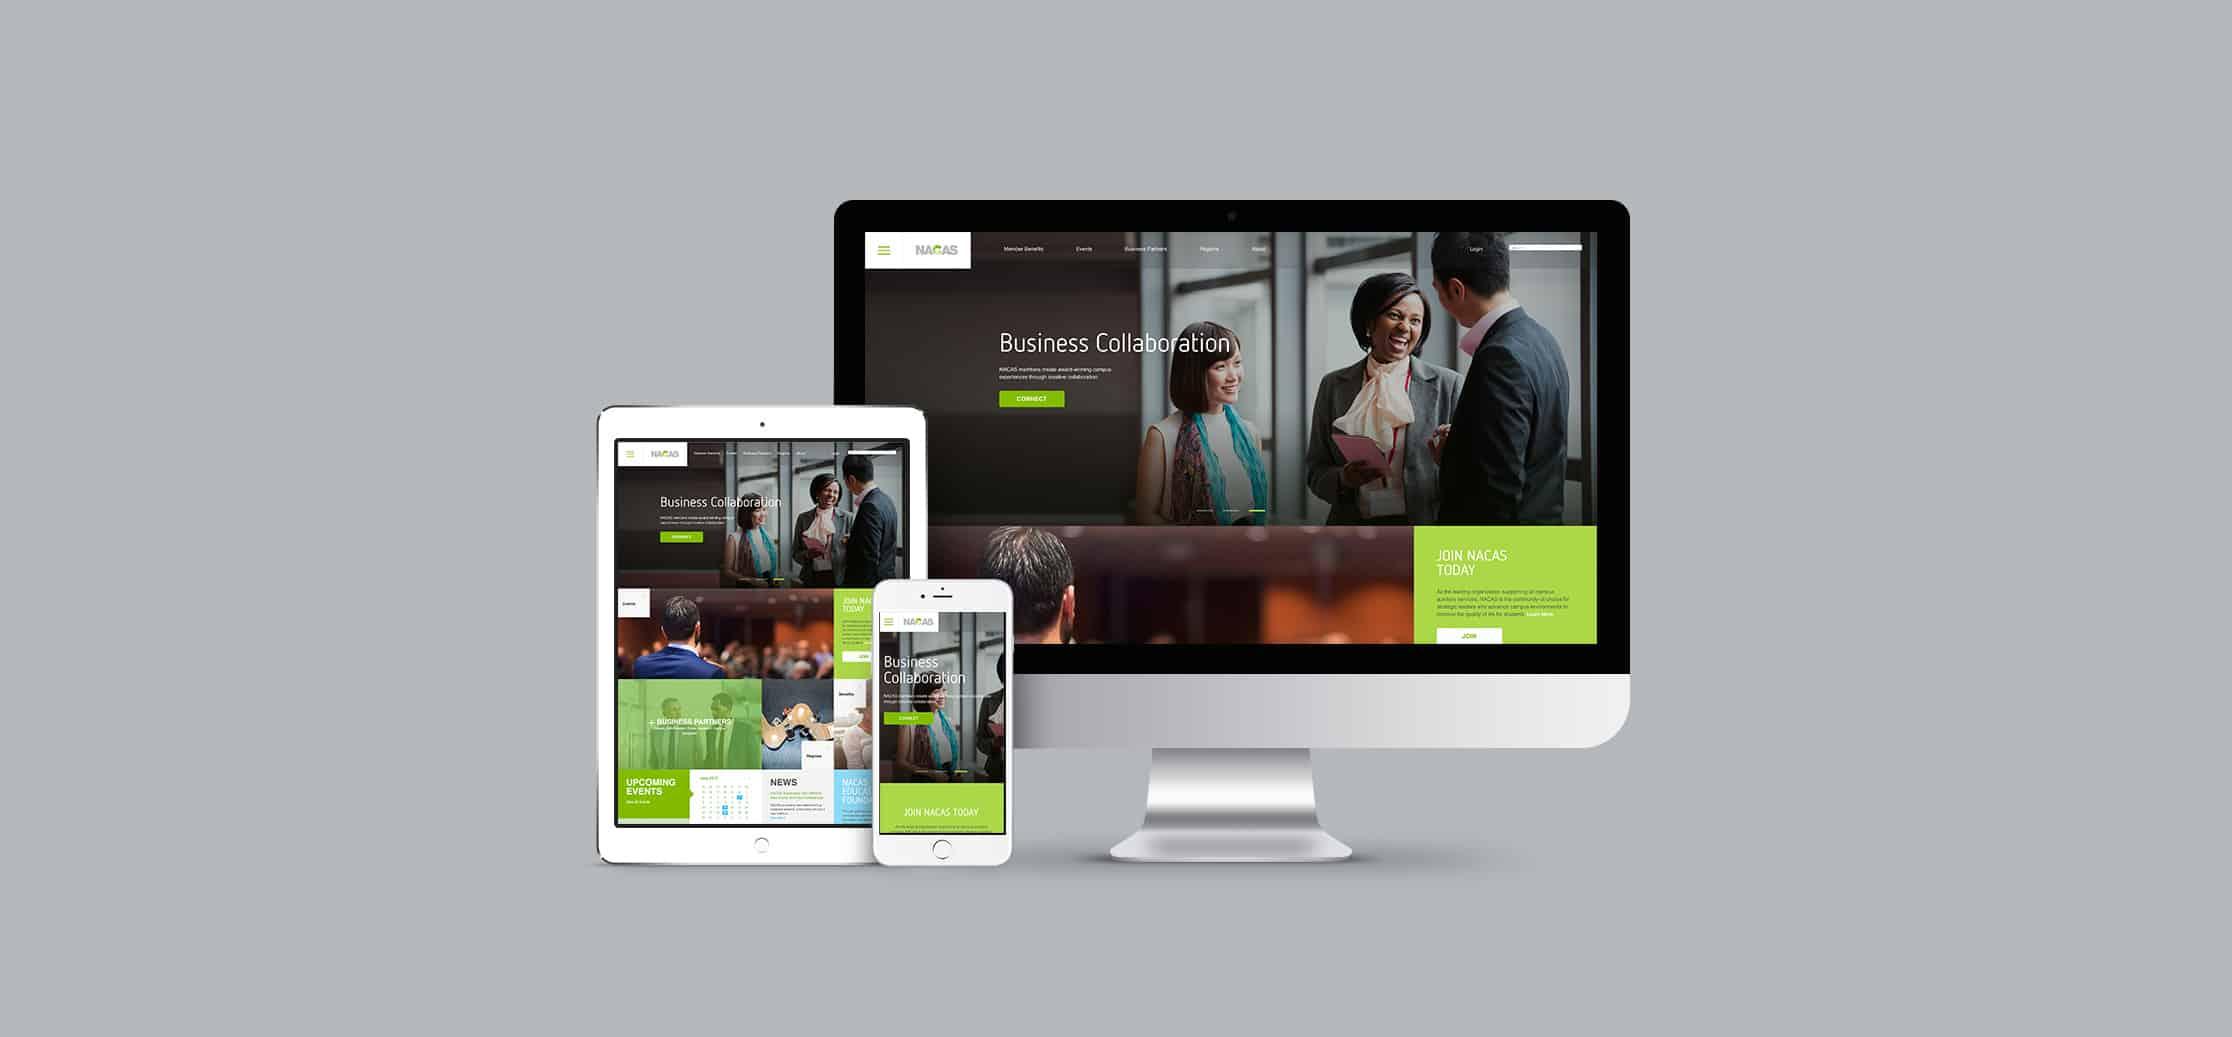 nacas-mobile-fullwidth-4